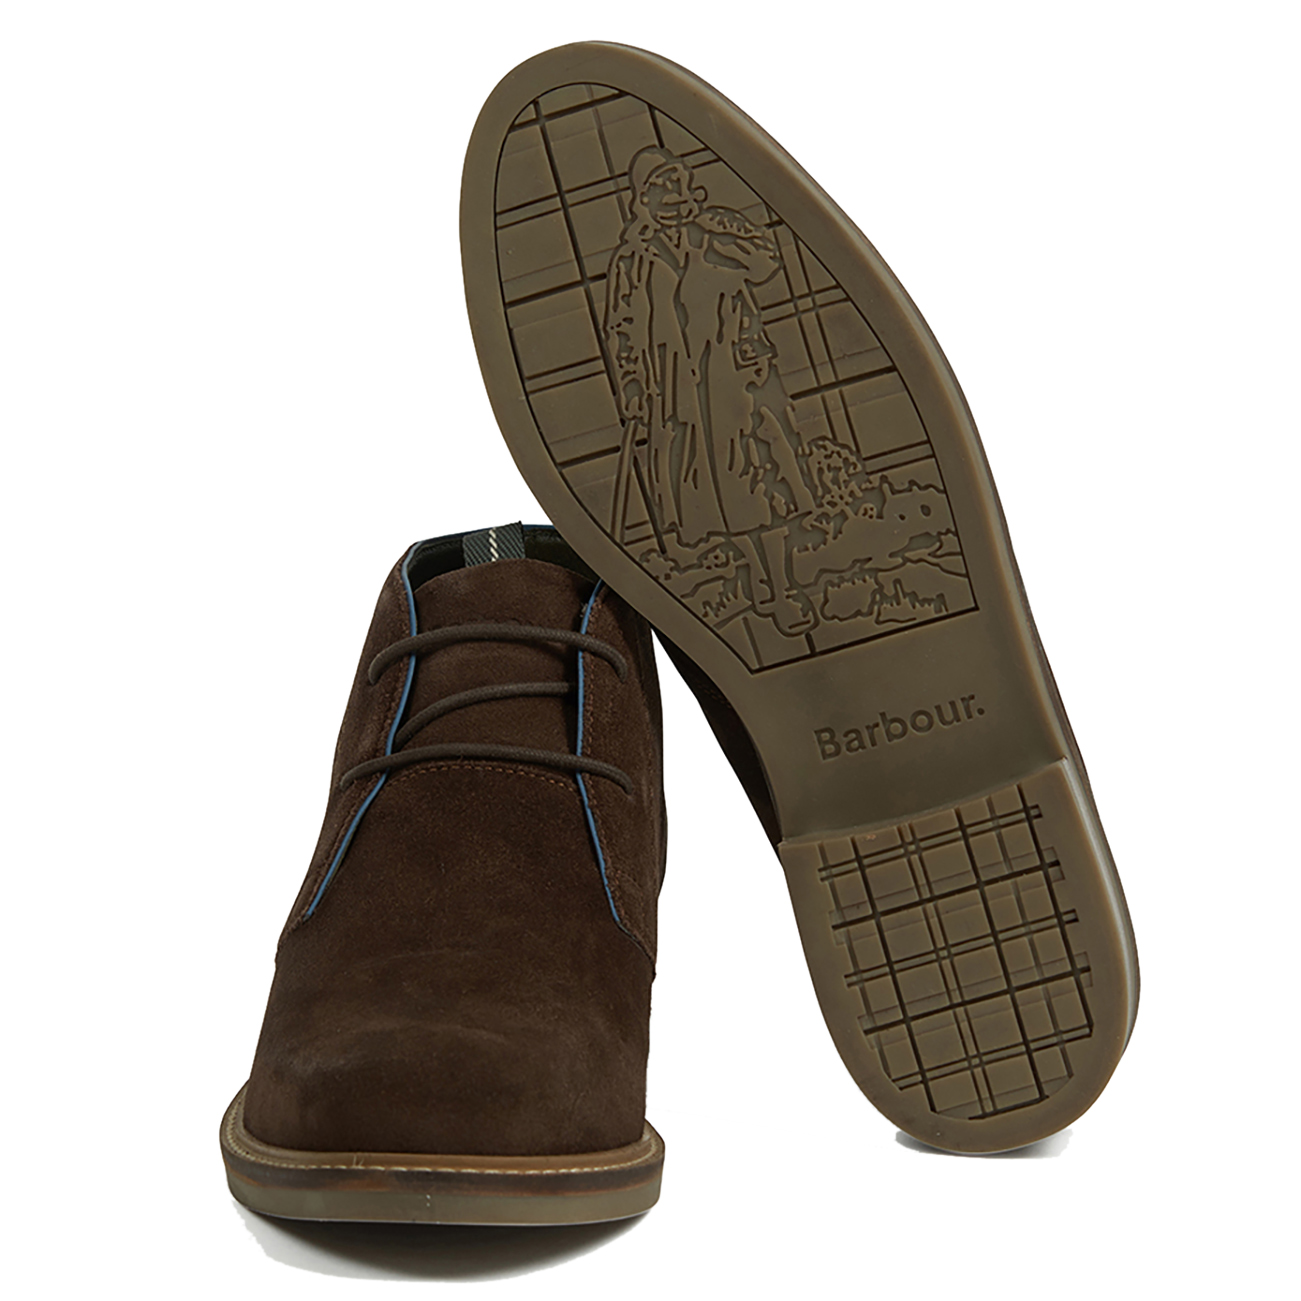 d9e6d38d58b Details about Mens Barbour Readhead Suede Smart Work Office Casual Lace Up  Desert Boot UK 6-12